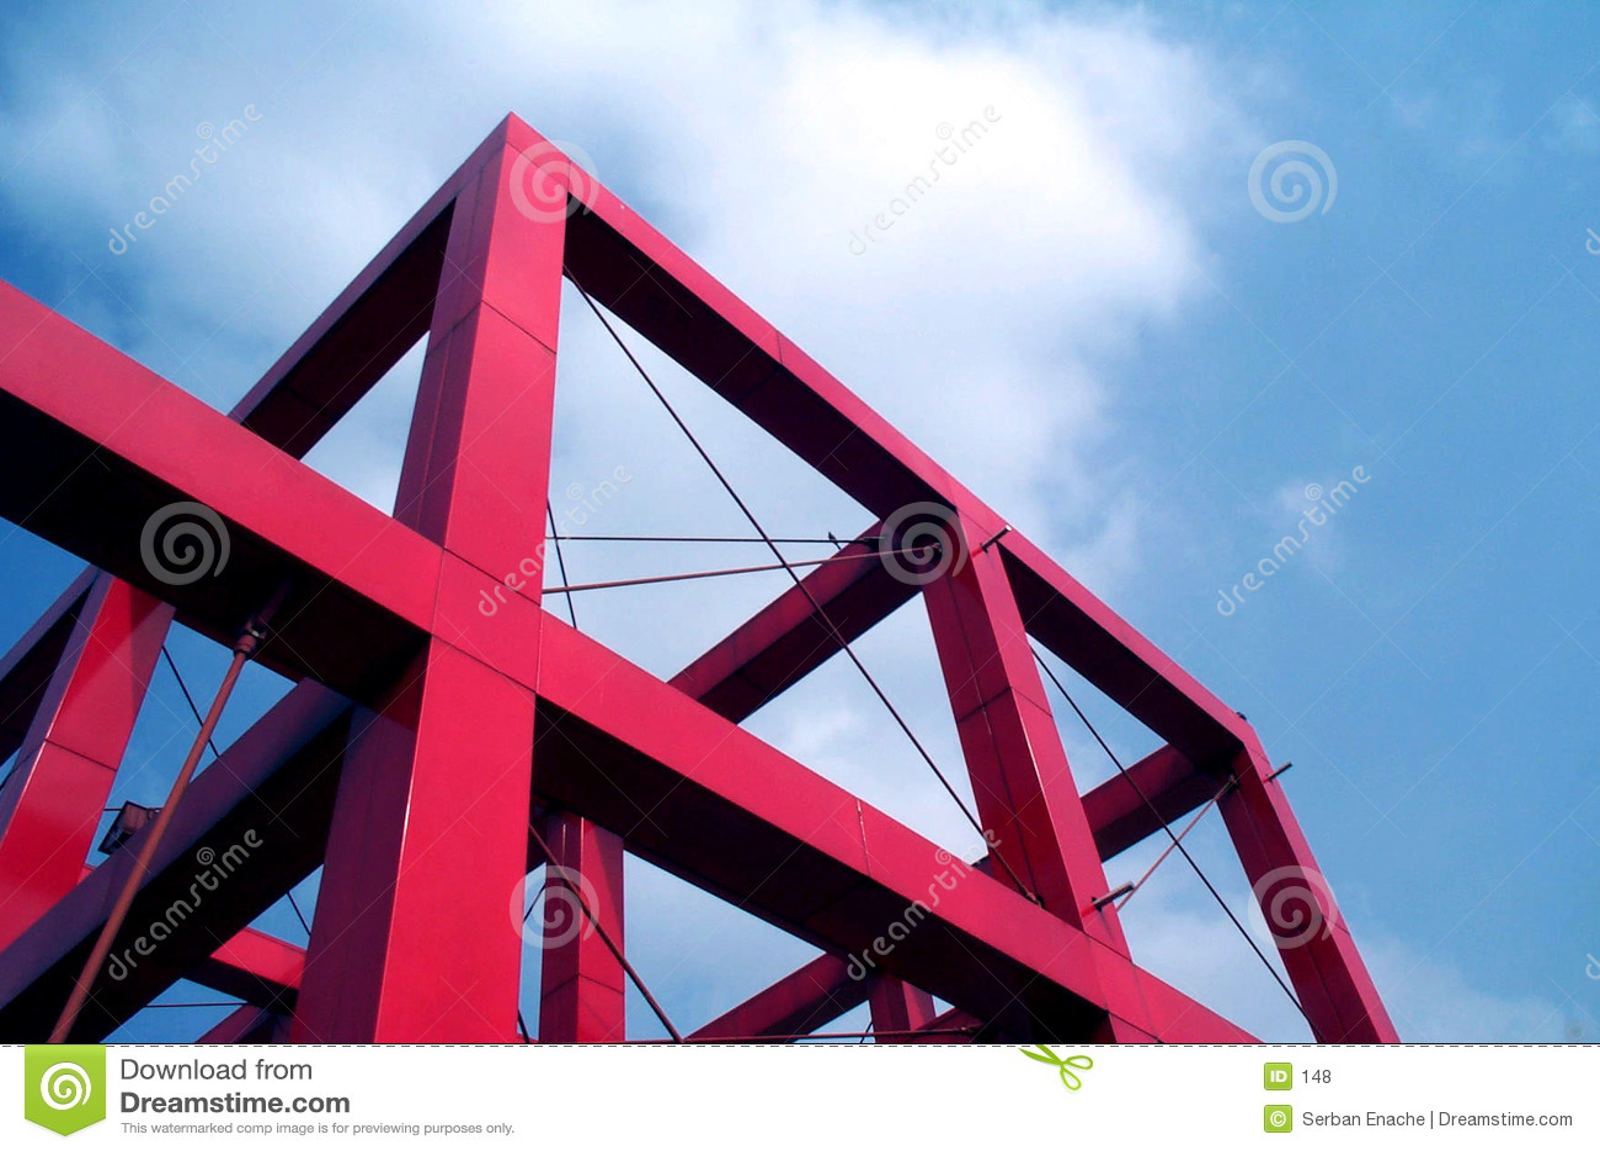 Rode kubus tegen blauwe hemel